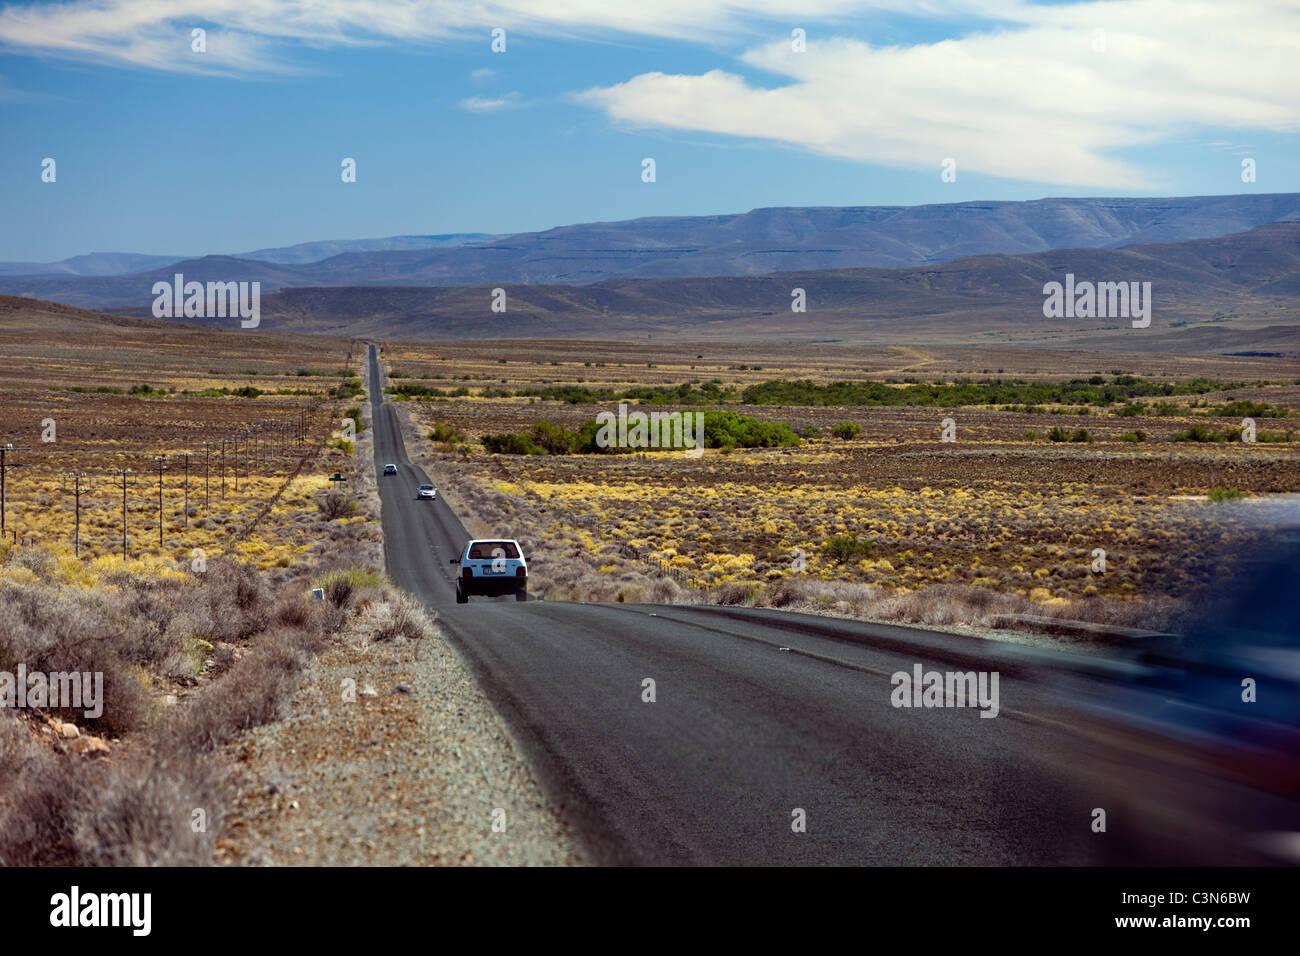 Sud Africa, Northern Cape, Sutherland, strada da Matjiesfontein. Immagini Stock